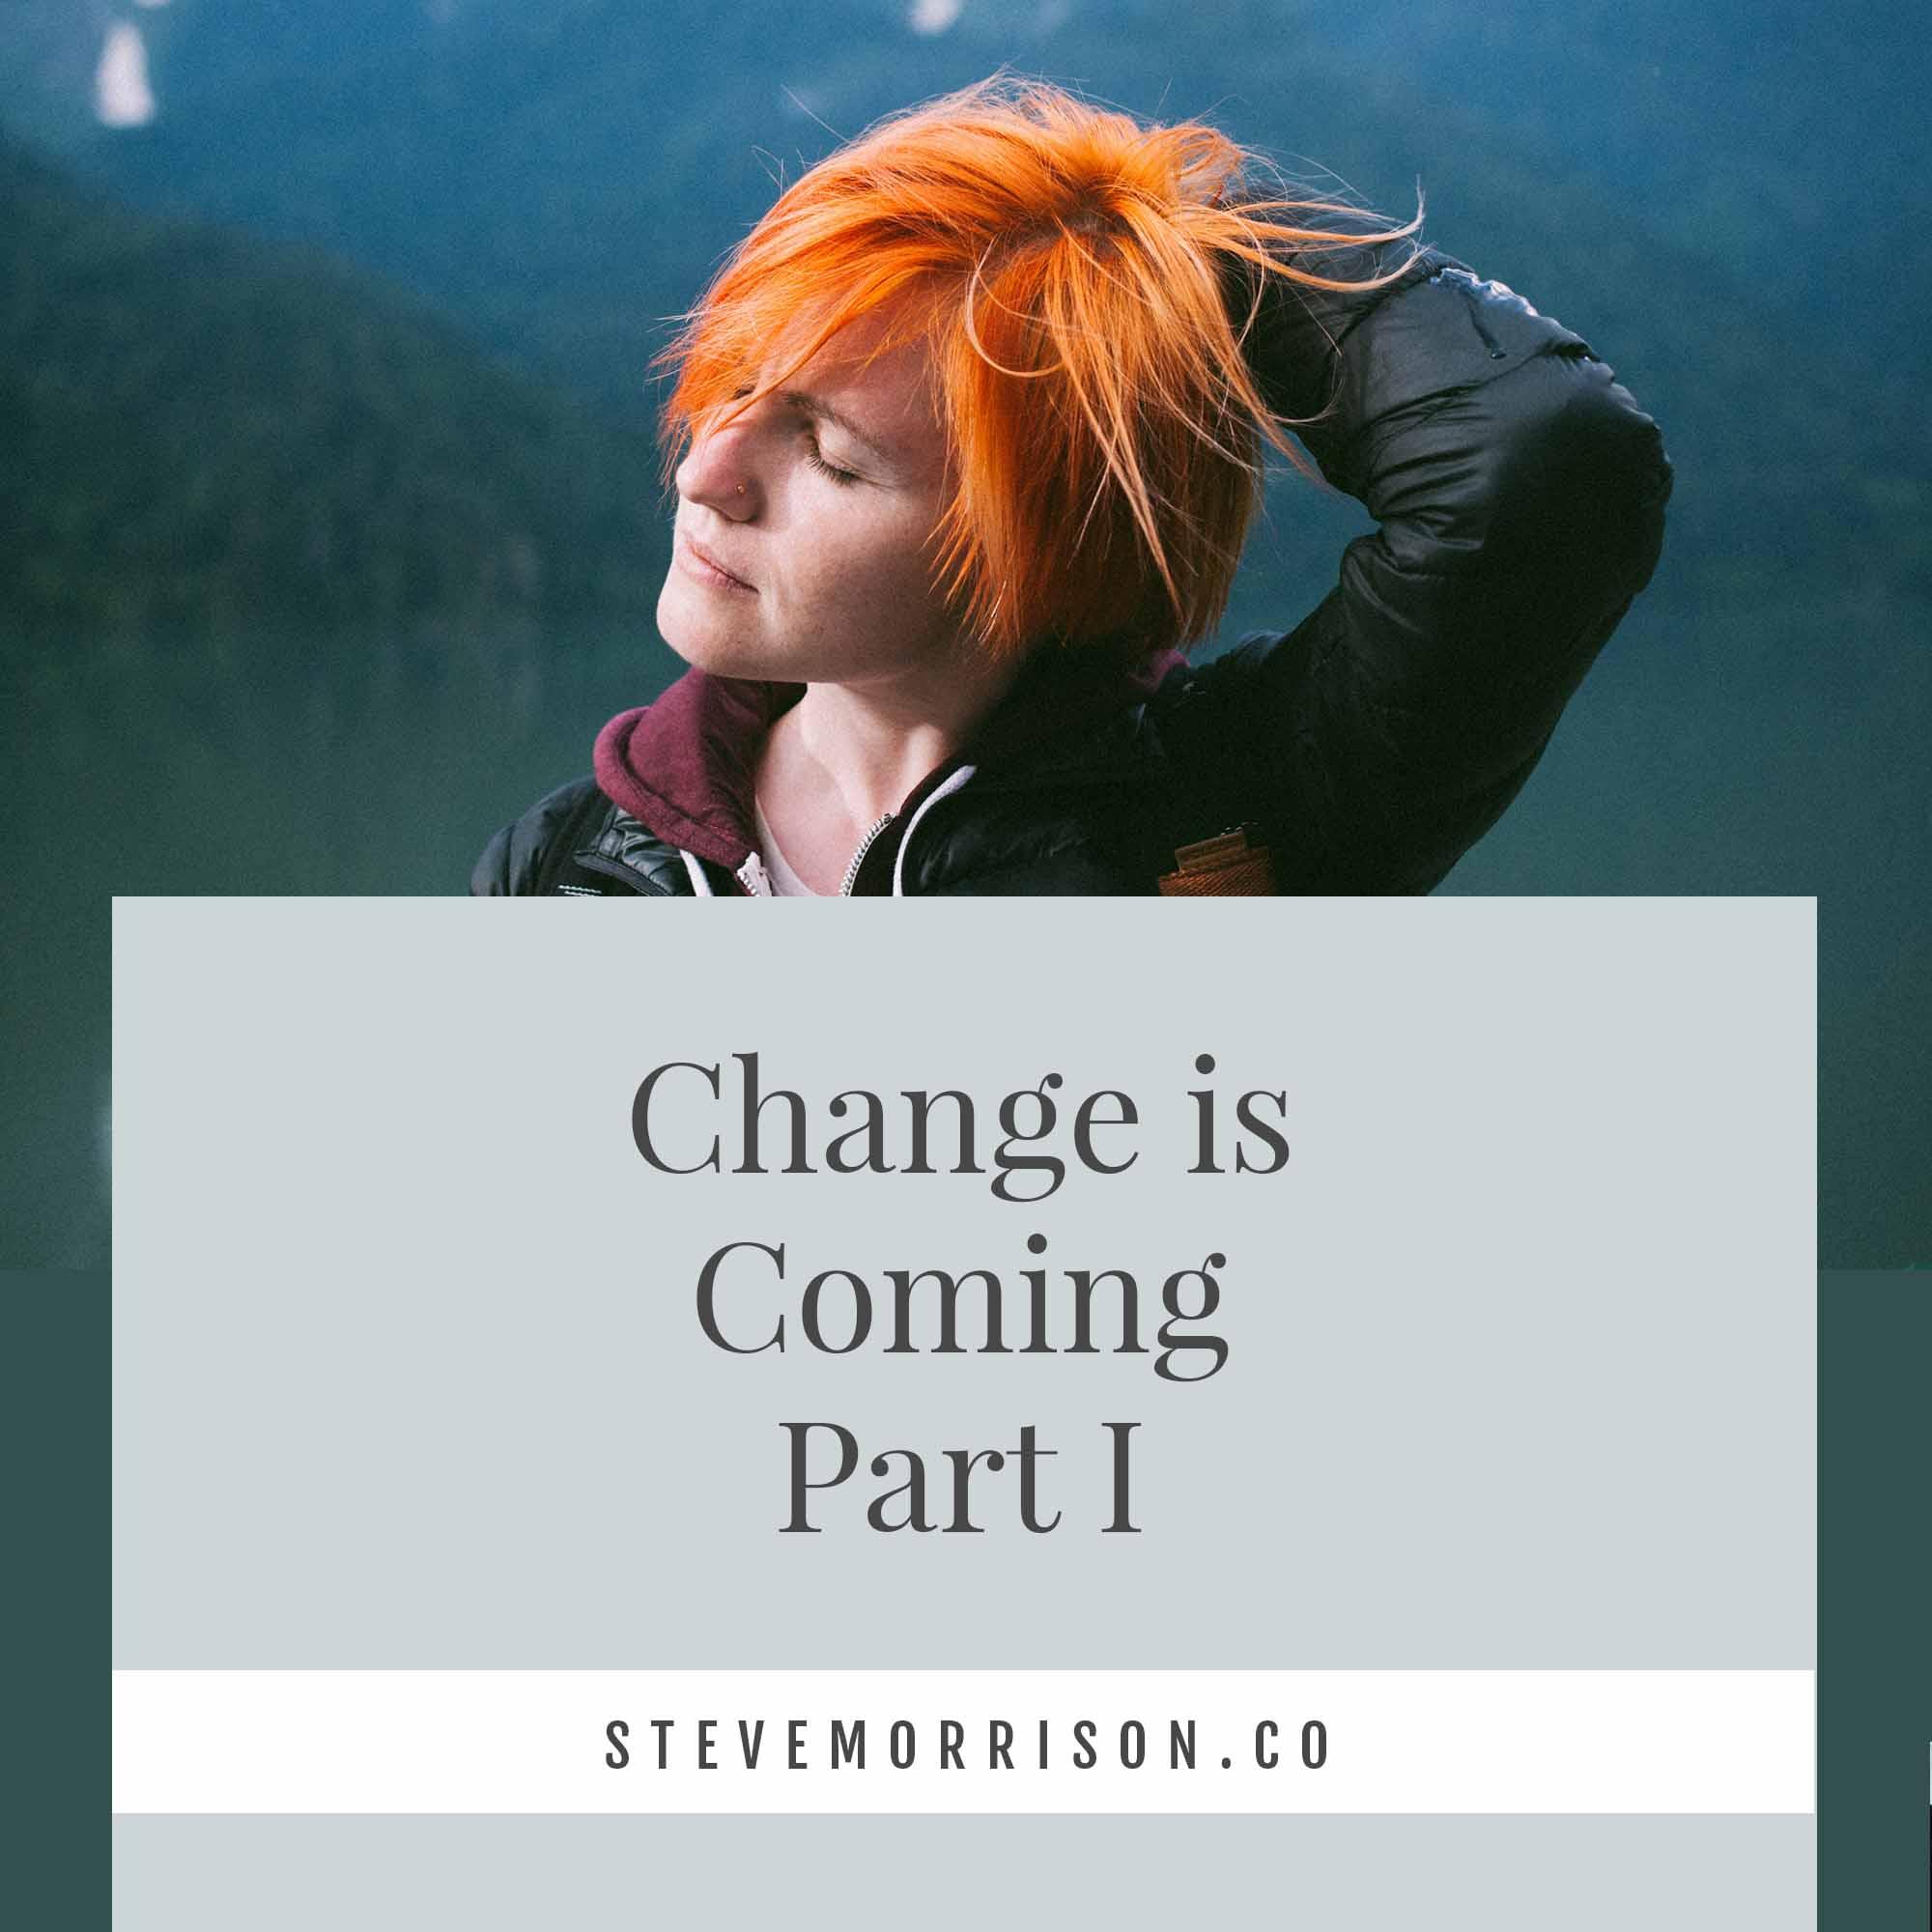 Change is Coming 1.jpg